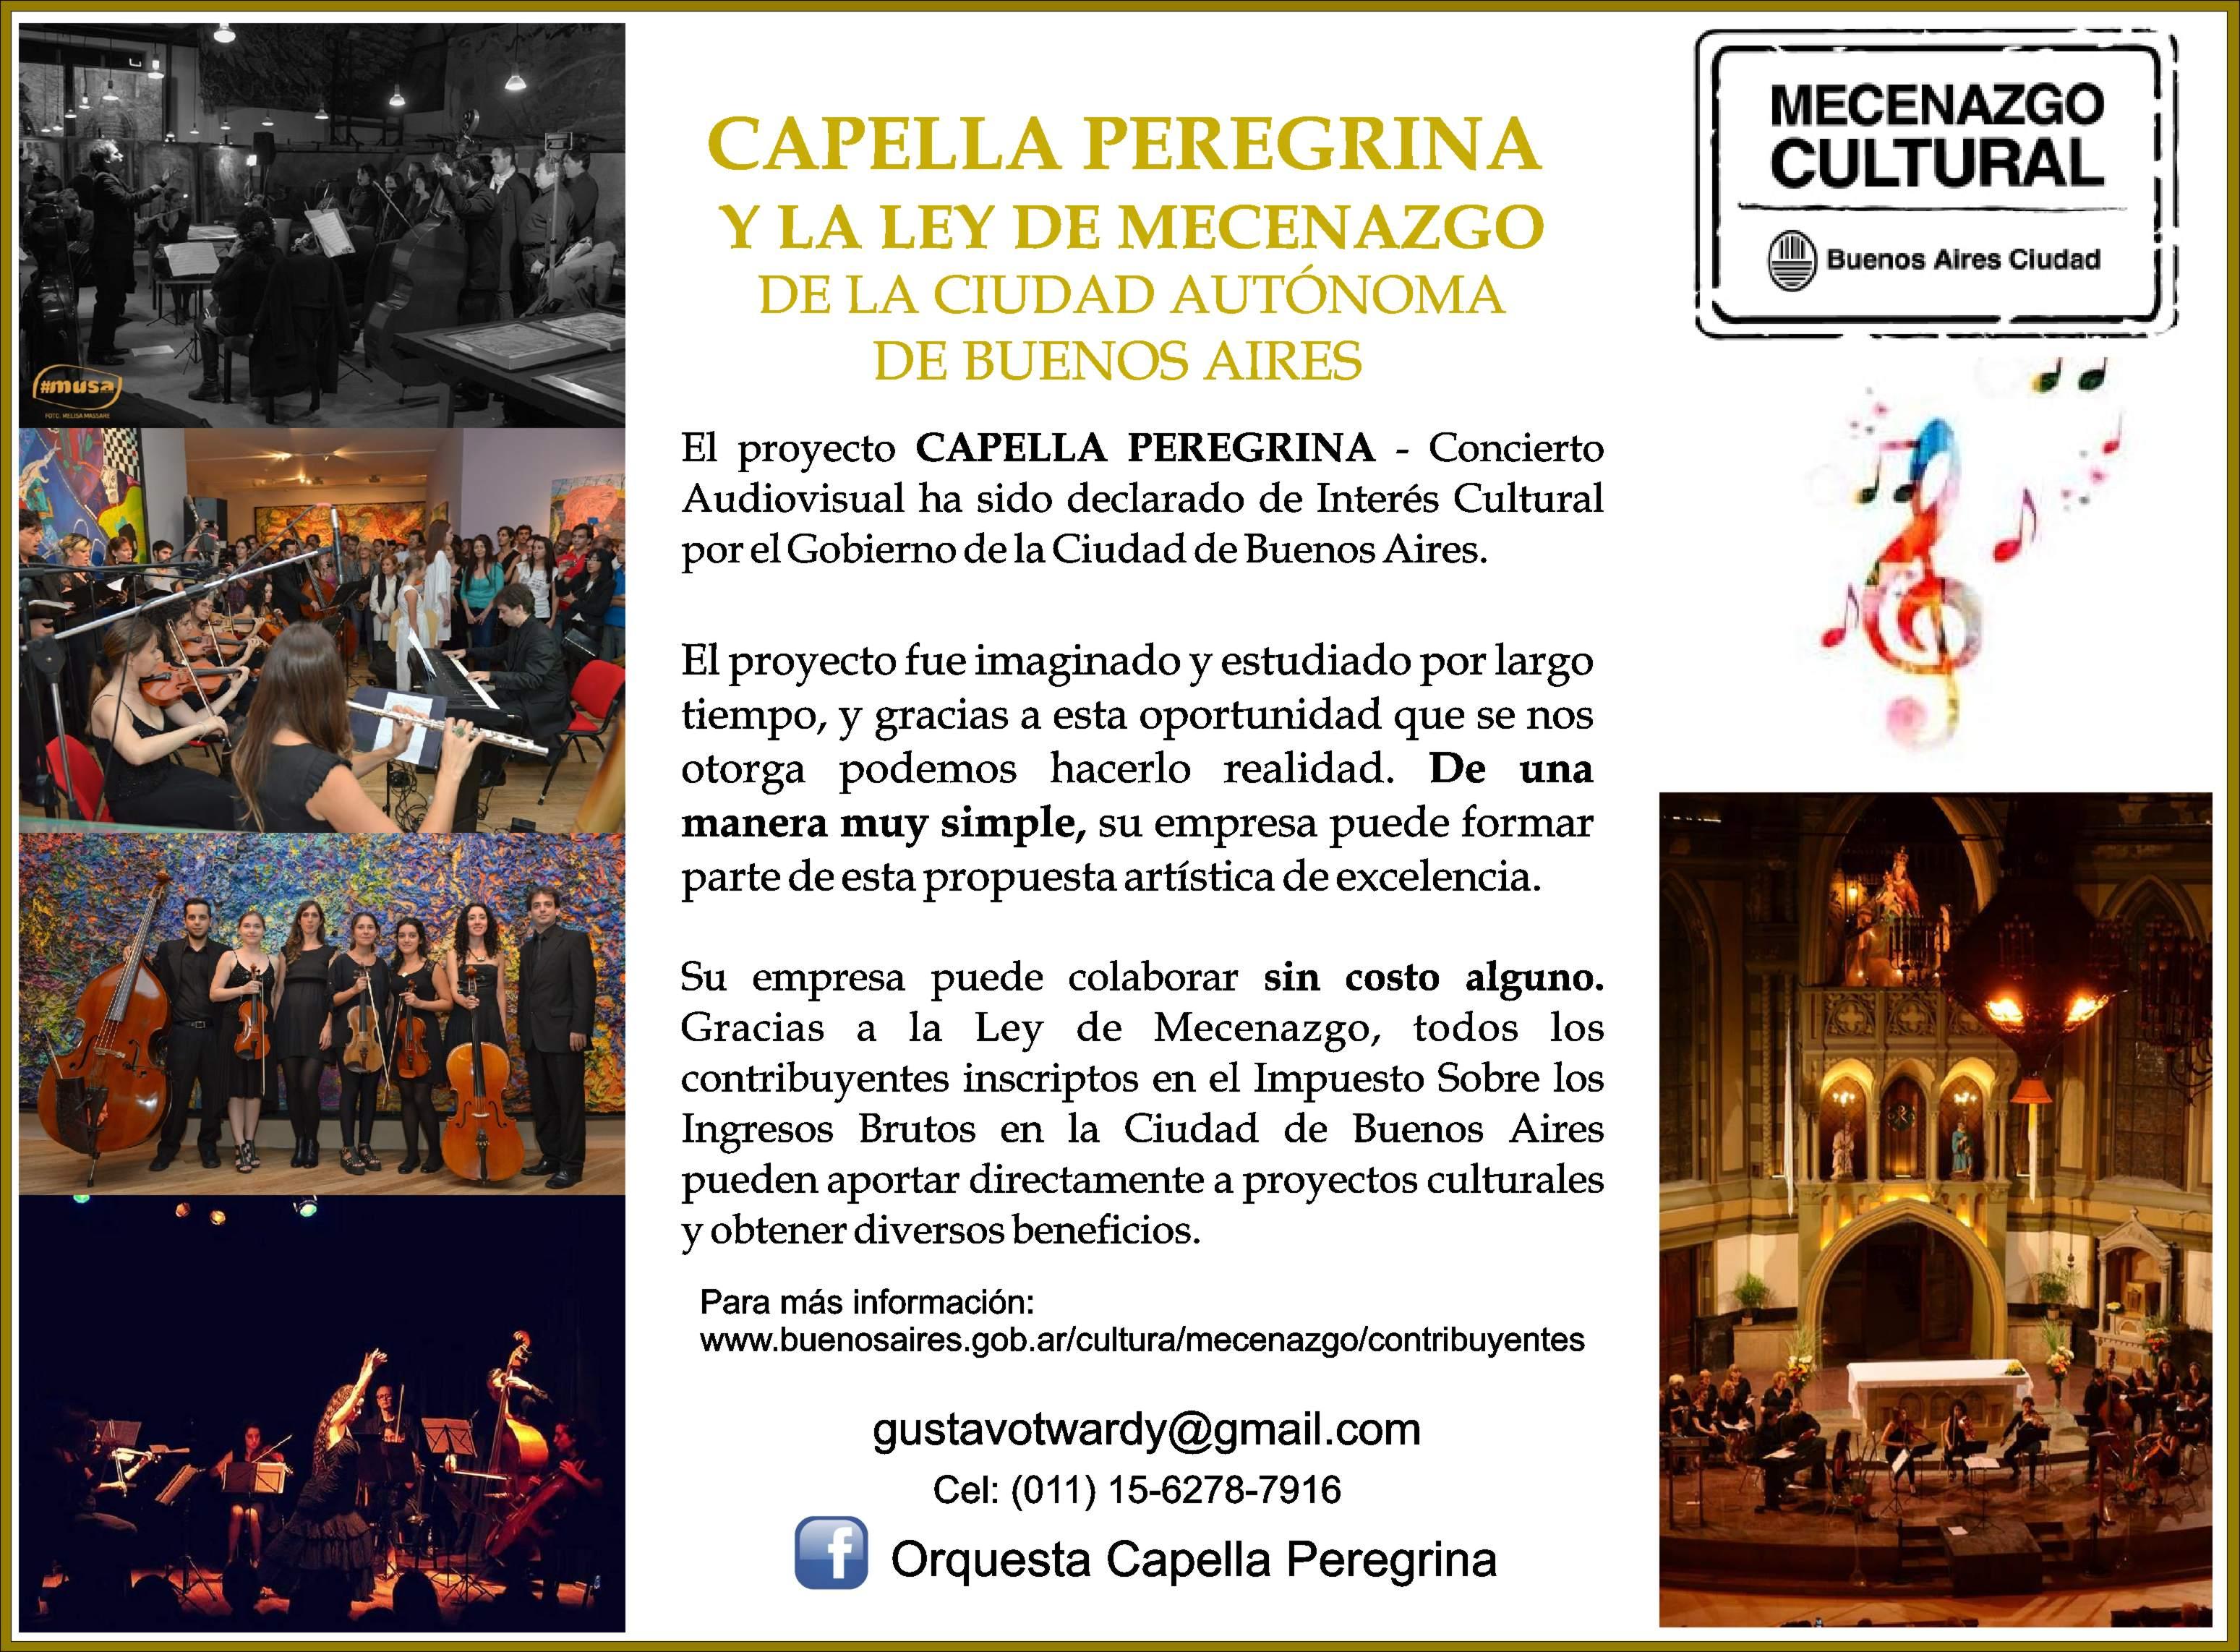 Mecenazco cultural 2015